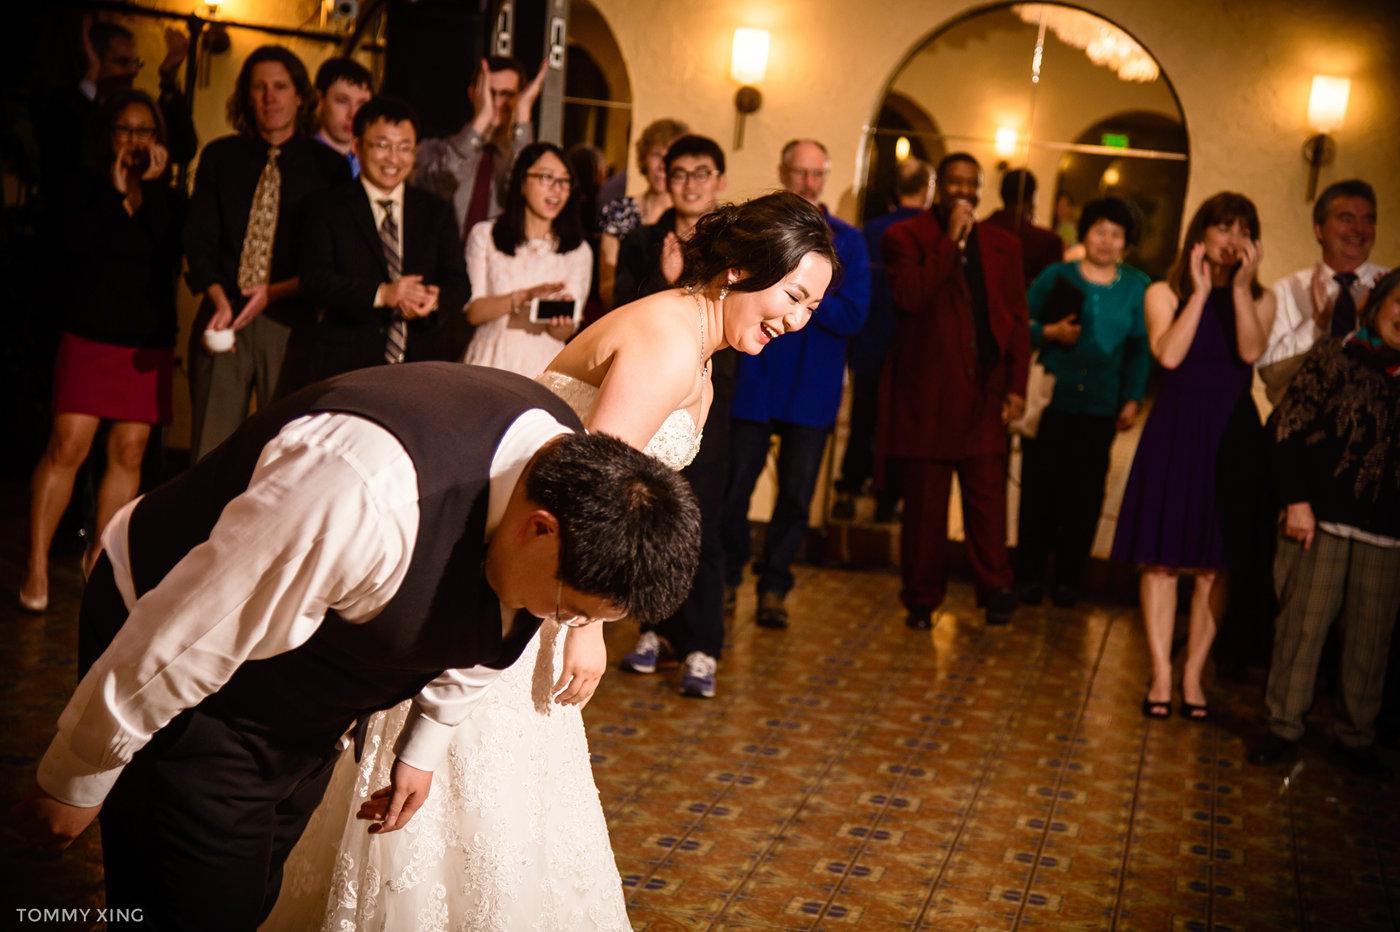 STANFORD MEMORIAL CHURCH WEDDING - Wenjie & Chengcheng - SAN FRANCISCO BAY AREA 斯坦福教堂婚礼跟拍 - 洛杉矶婚礼婚纱照摄影师 Tommy Xing Photography258.jpg